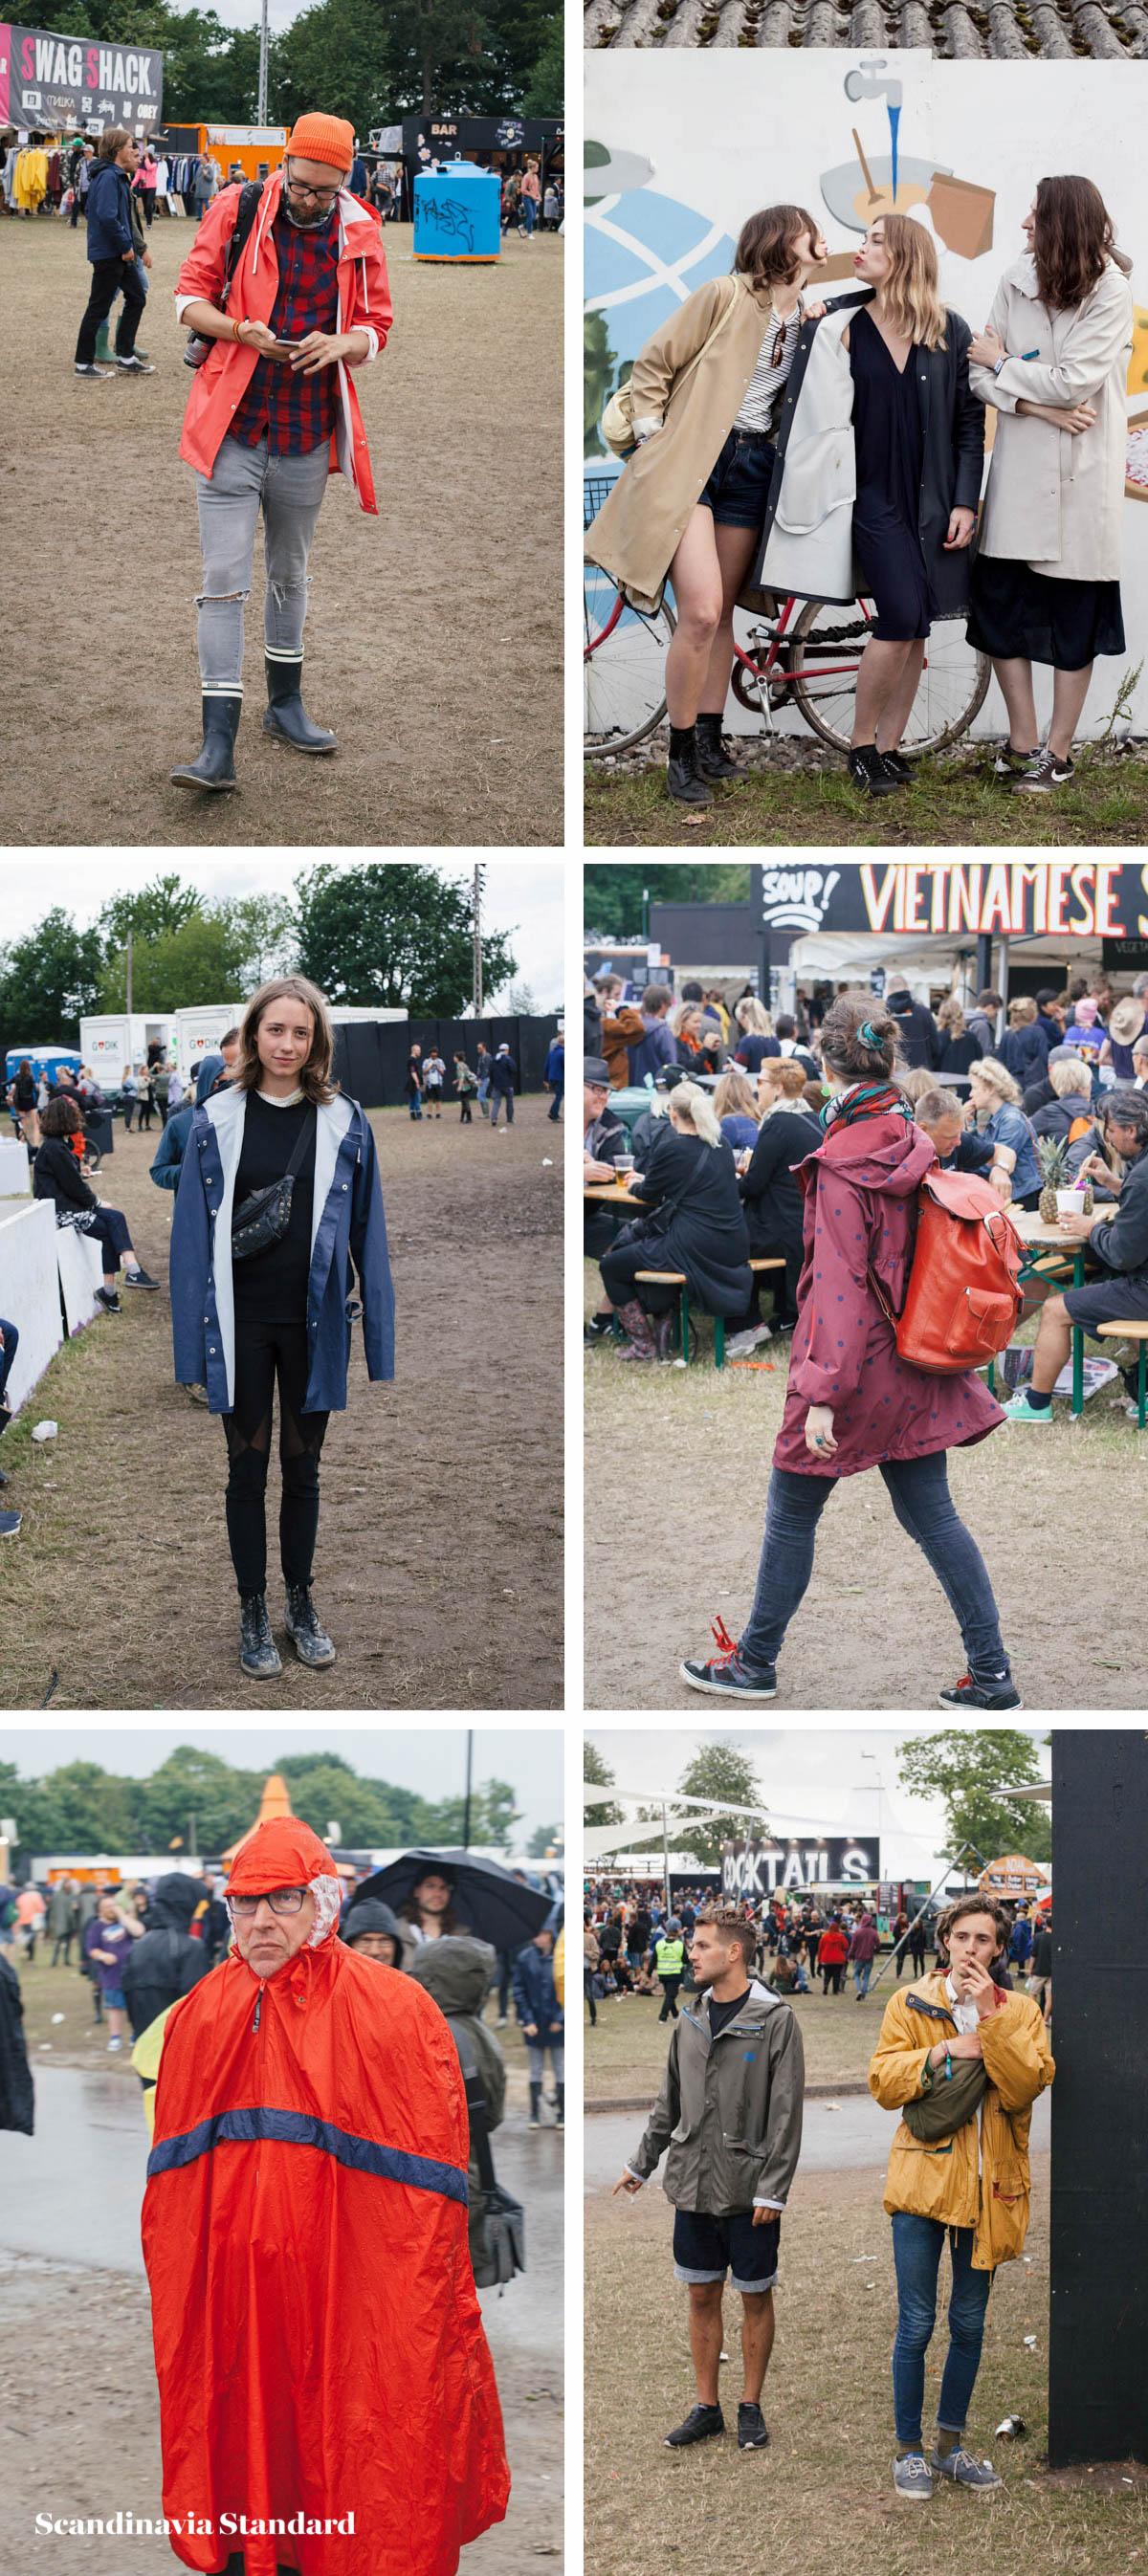 Raincoats - Scandinavia Standard